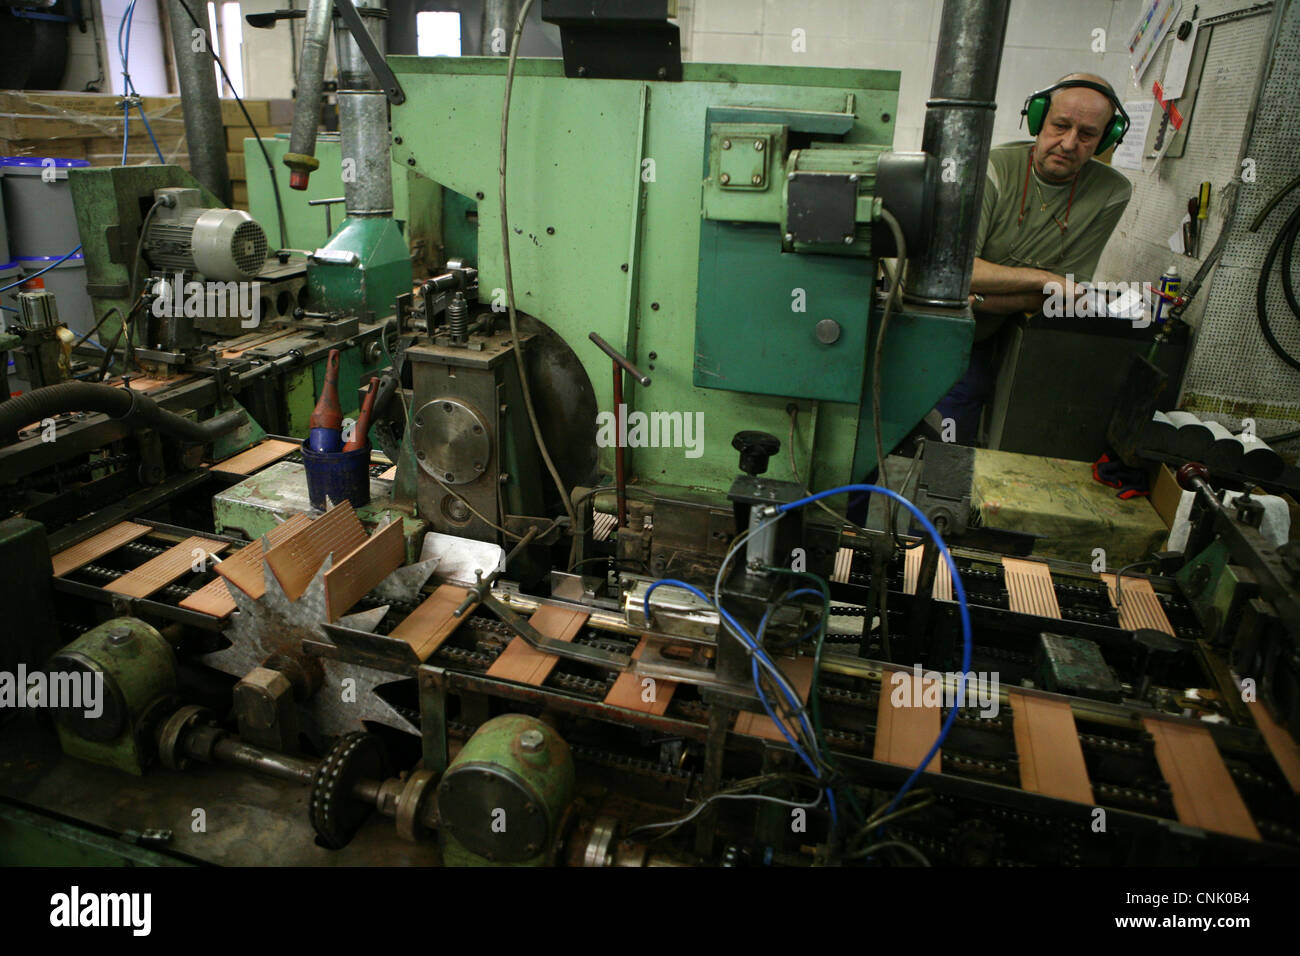 Koh-i-Noor Hardtmuth. Famous pencil manufacturer in Ceske Budejovice, Czech Republic. - Stock Image